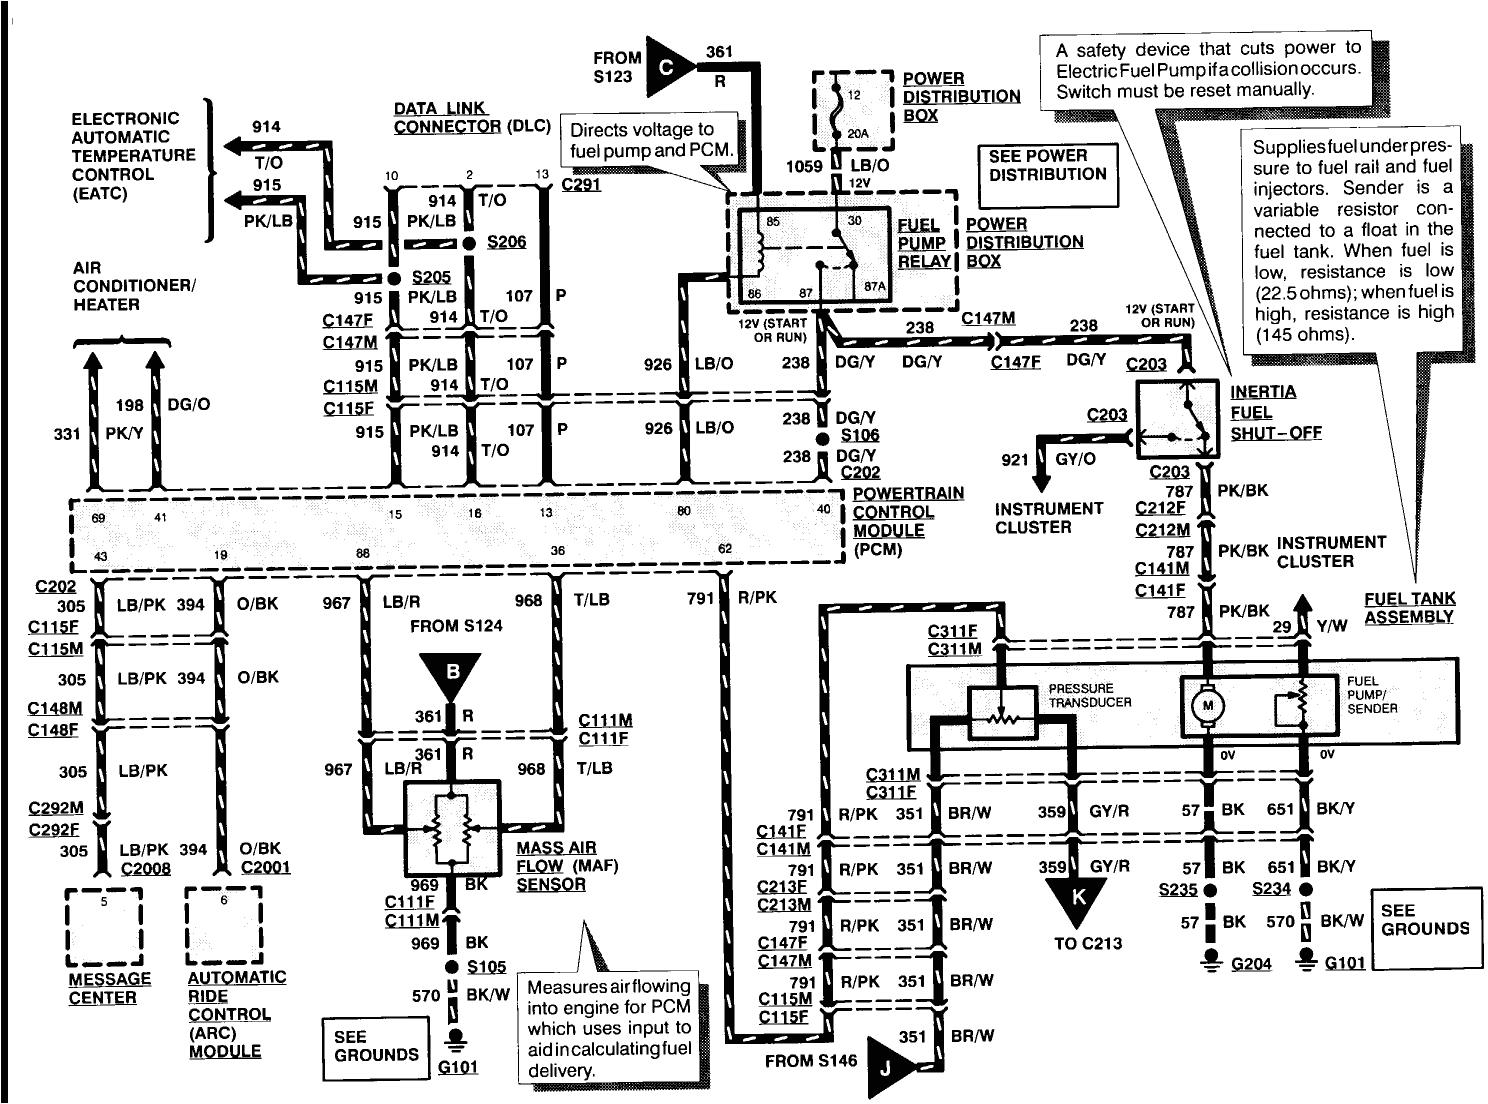 1996 explorer wiring diagram schema diagram database 1996 ford explorer wiring diagram door lock 96 explorer